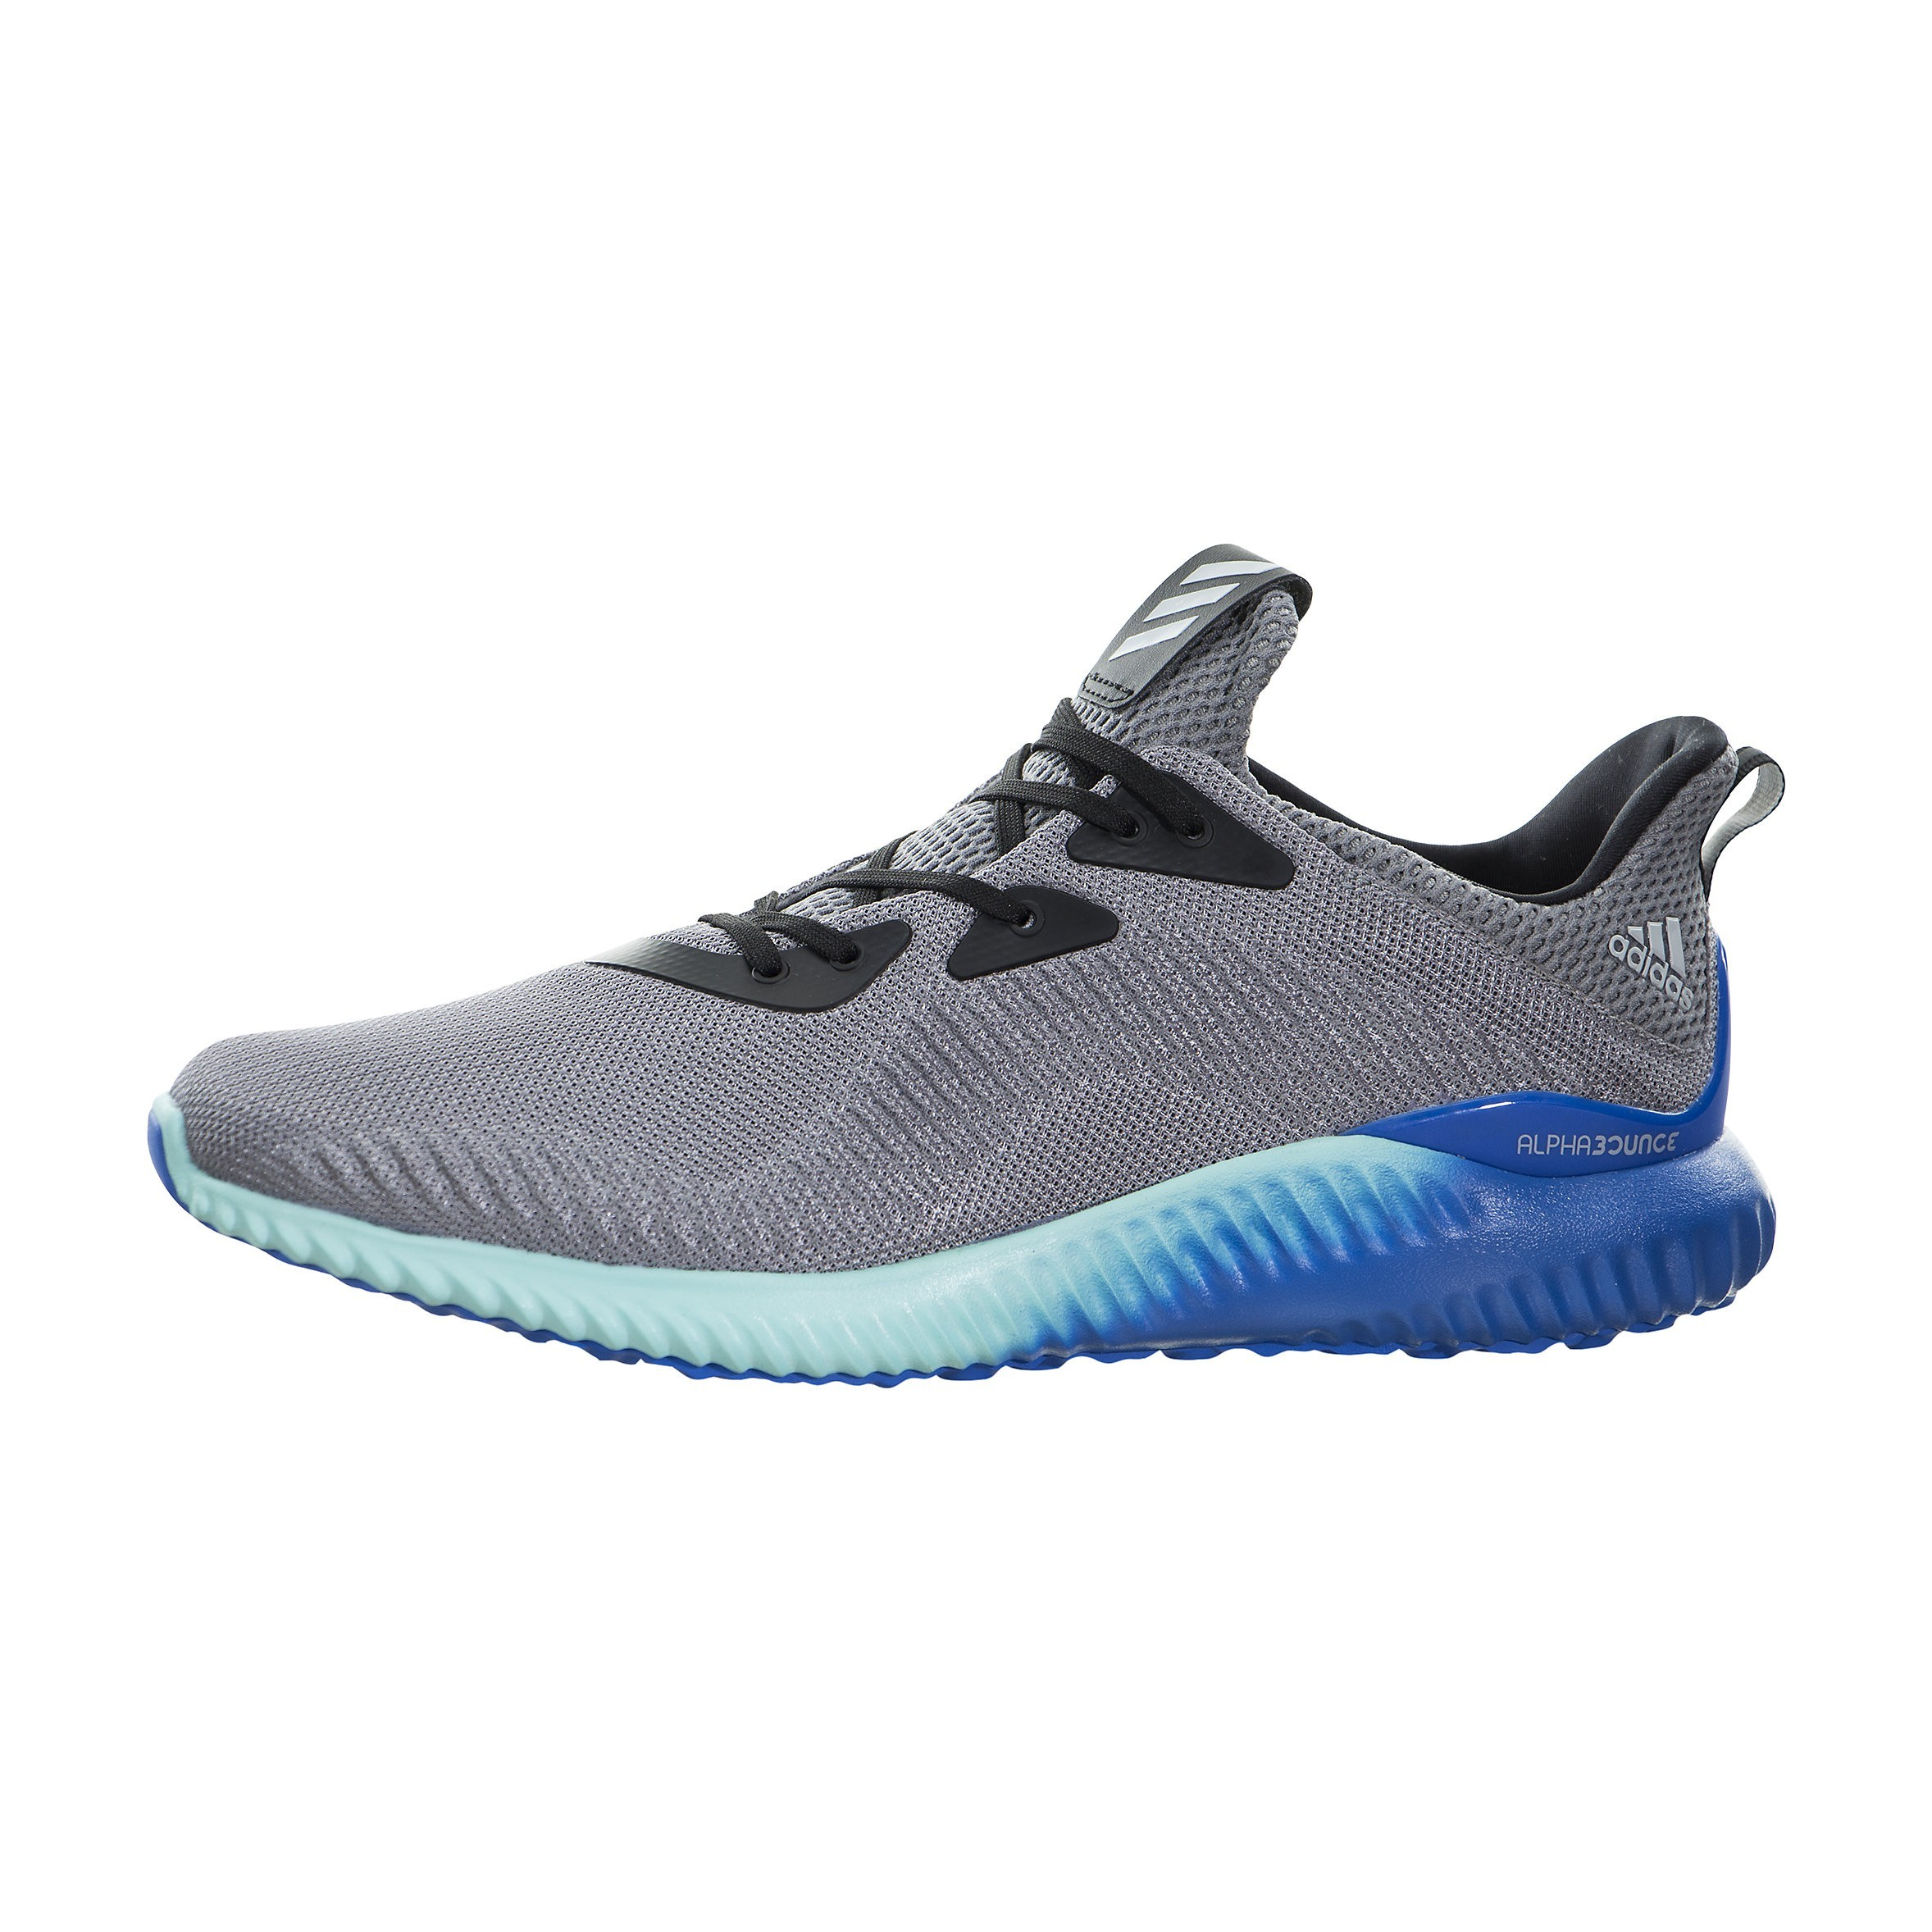 Adidas Alphabounce Grises/Energy/Aqua Corriendo Zapatilla Hombre BB9035